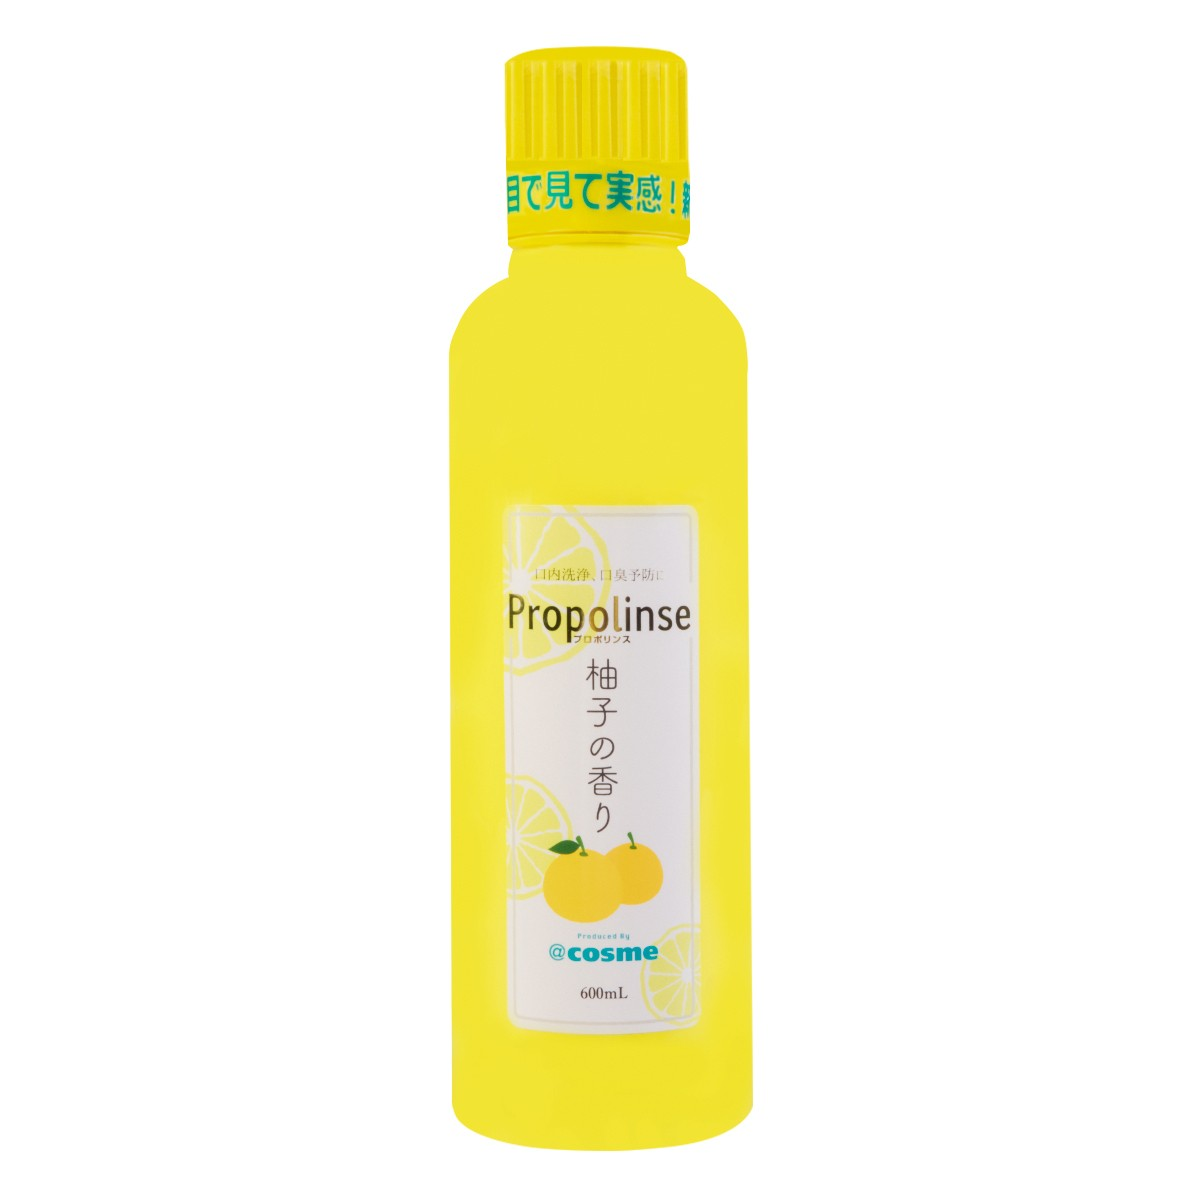 PROPOLINSE Refreshing Yuzu Mouthwash 600ml [Limited Edition]